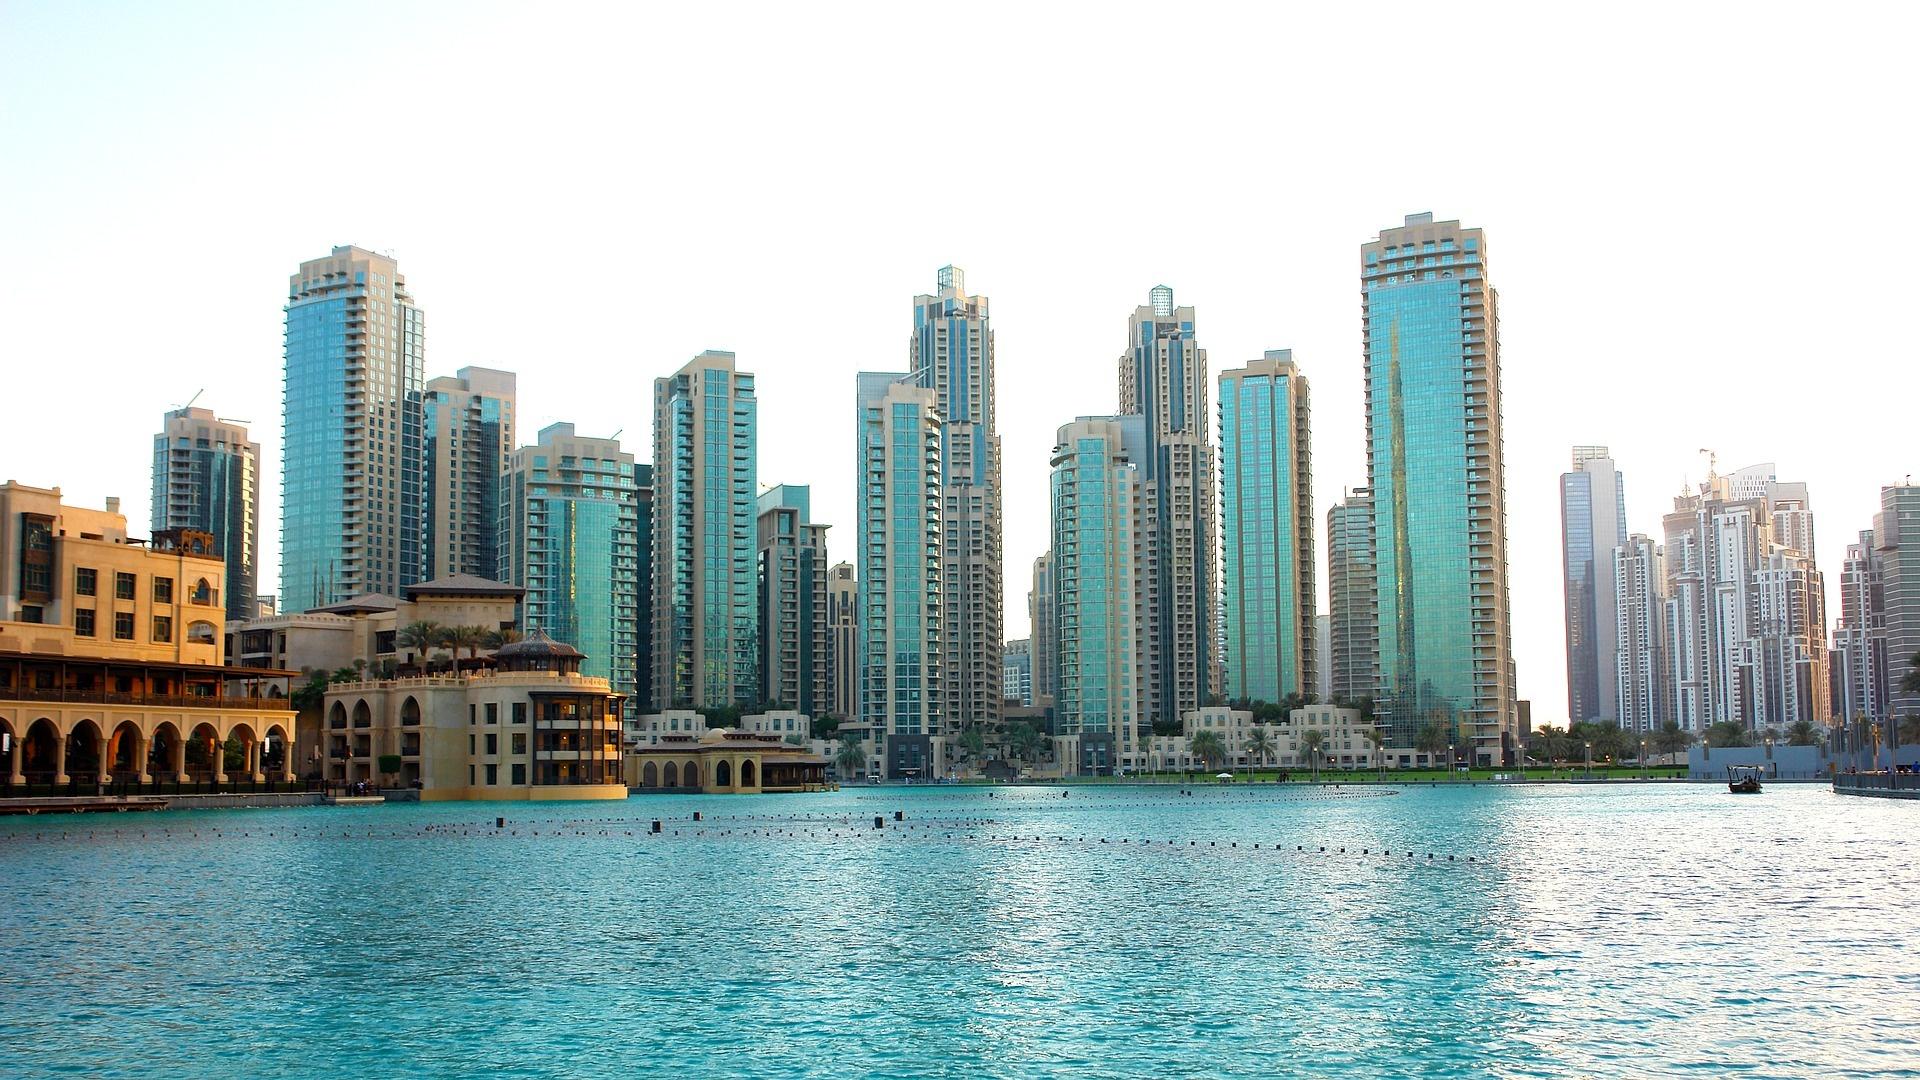 Dubai background wallpaper